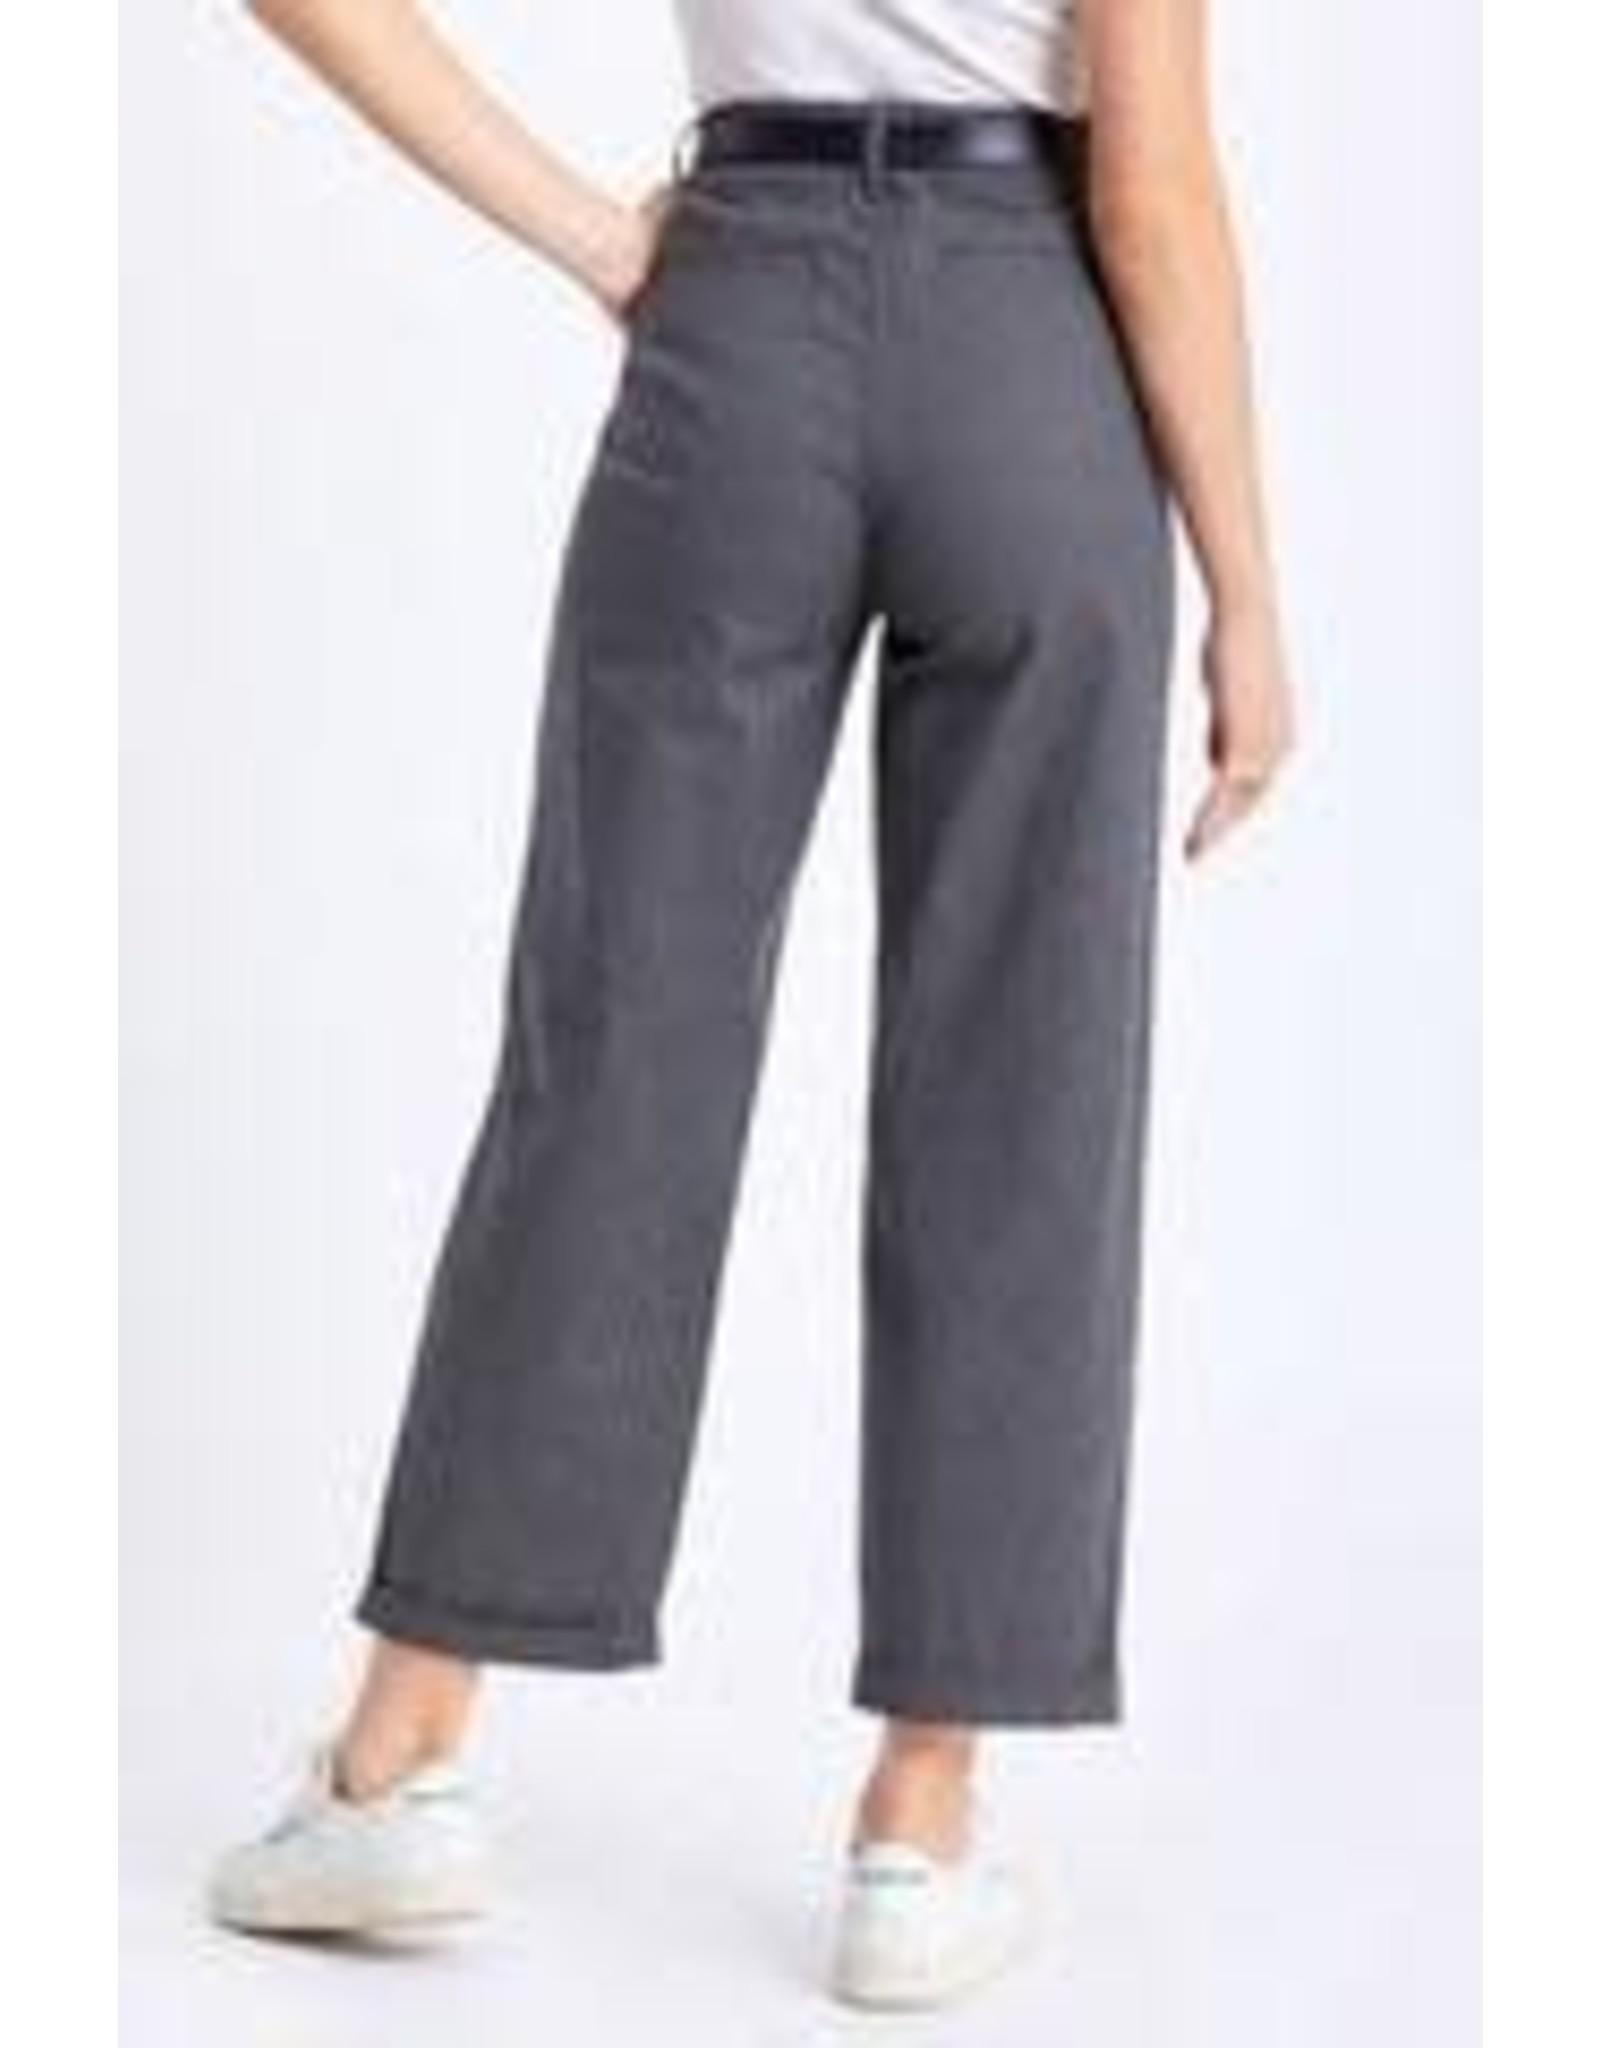 Brixton Brixton - Pantalon femme victory trouser black/grey